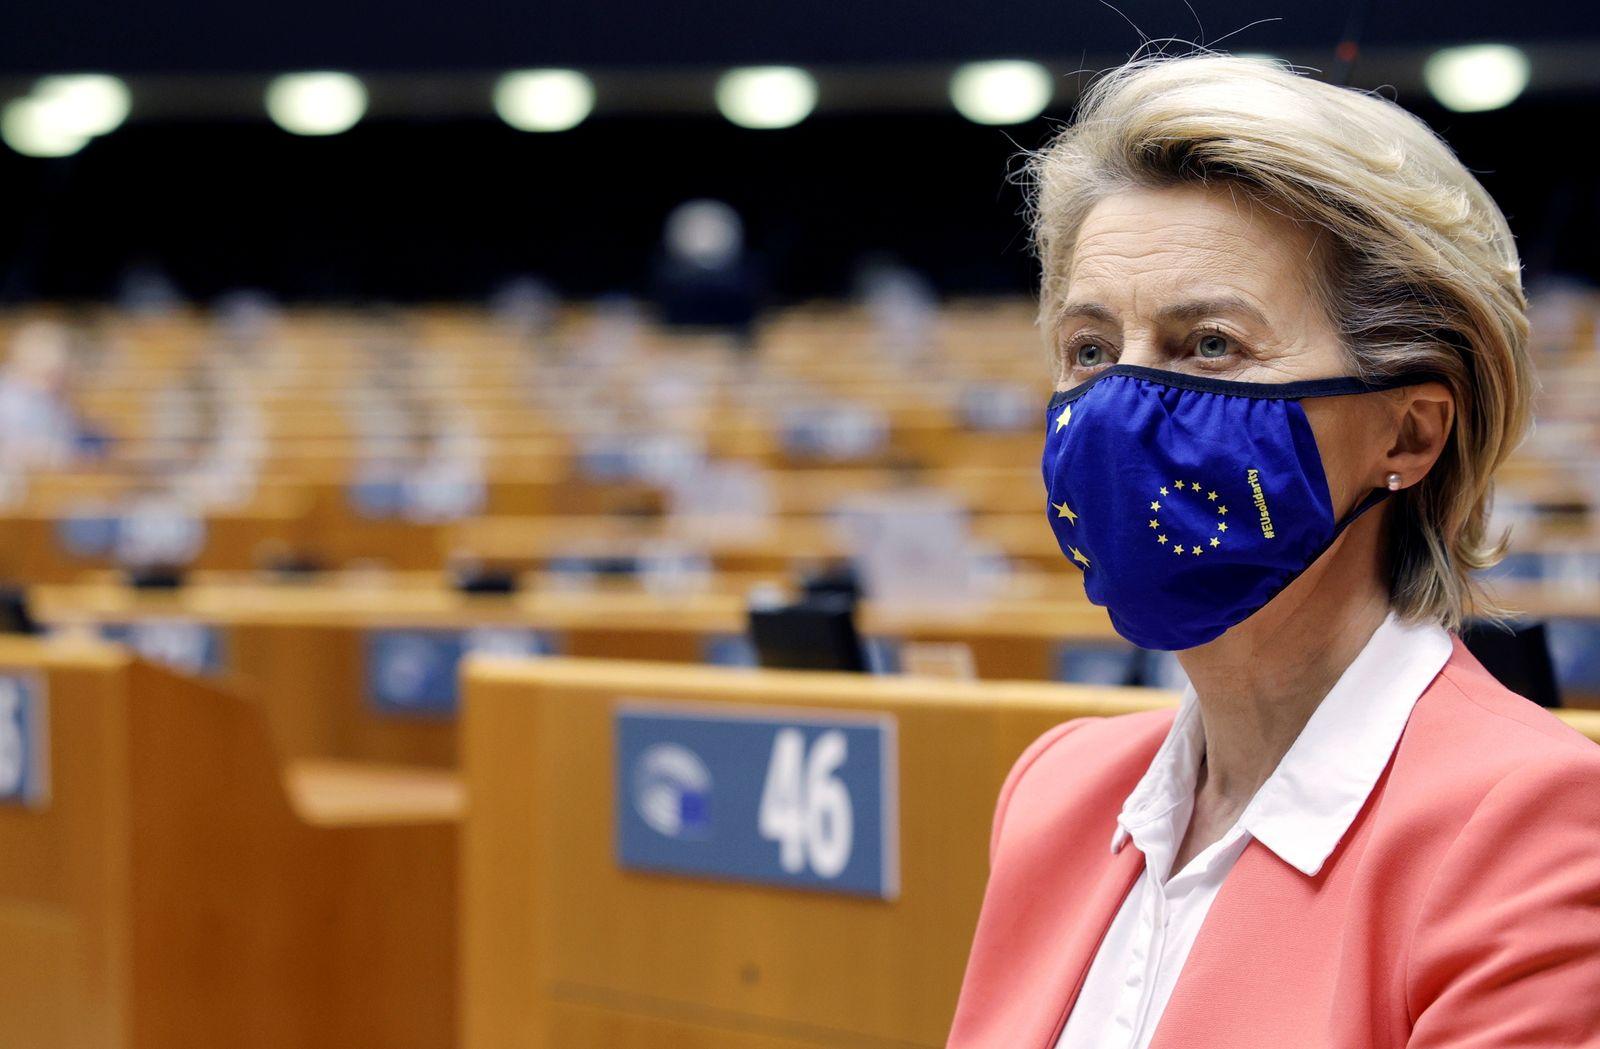 Debate on Turkey at the European Parliament in Brussels